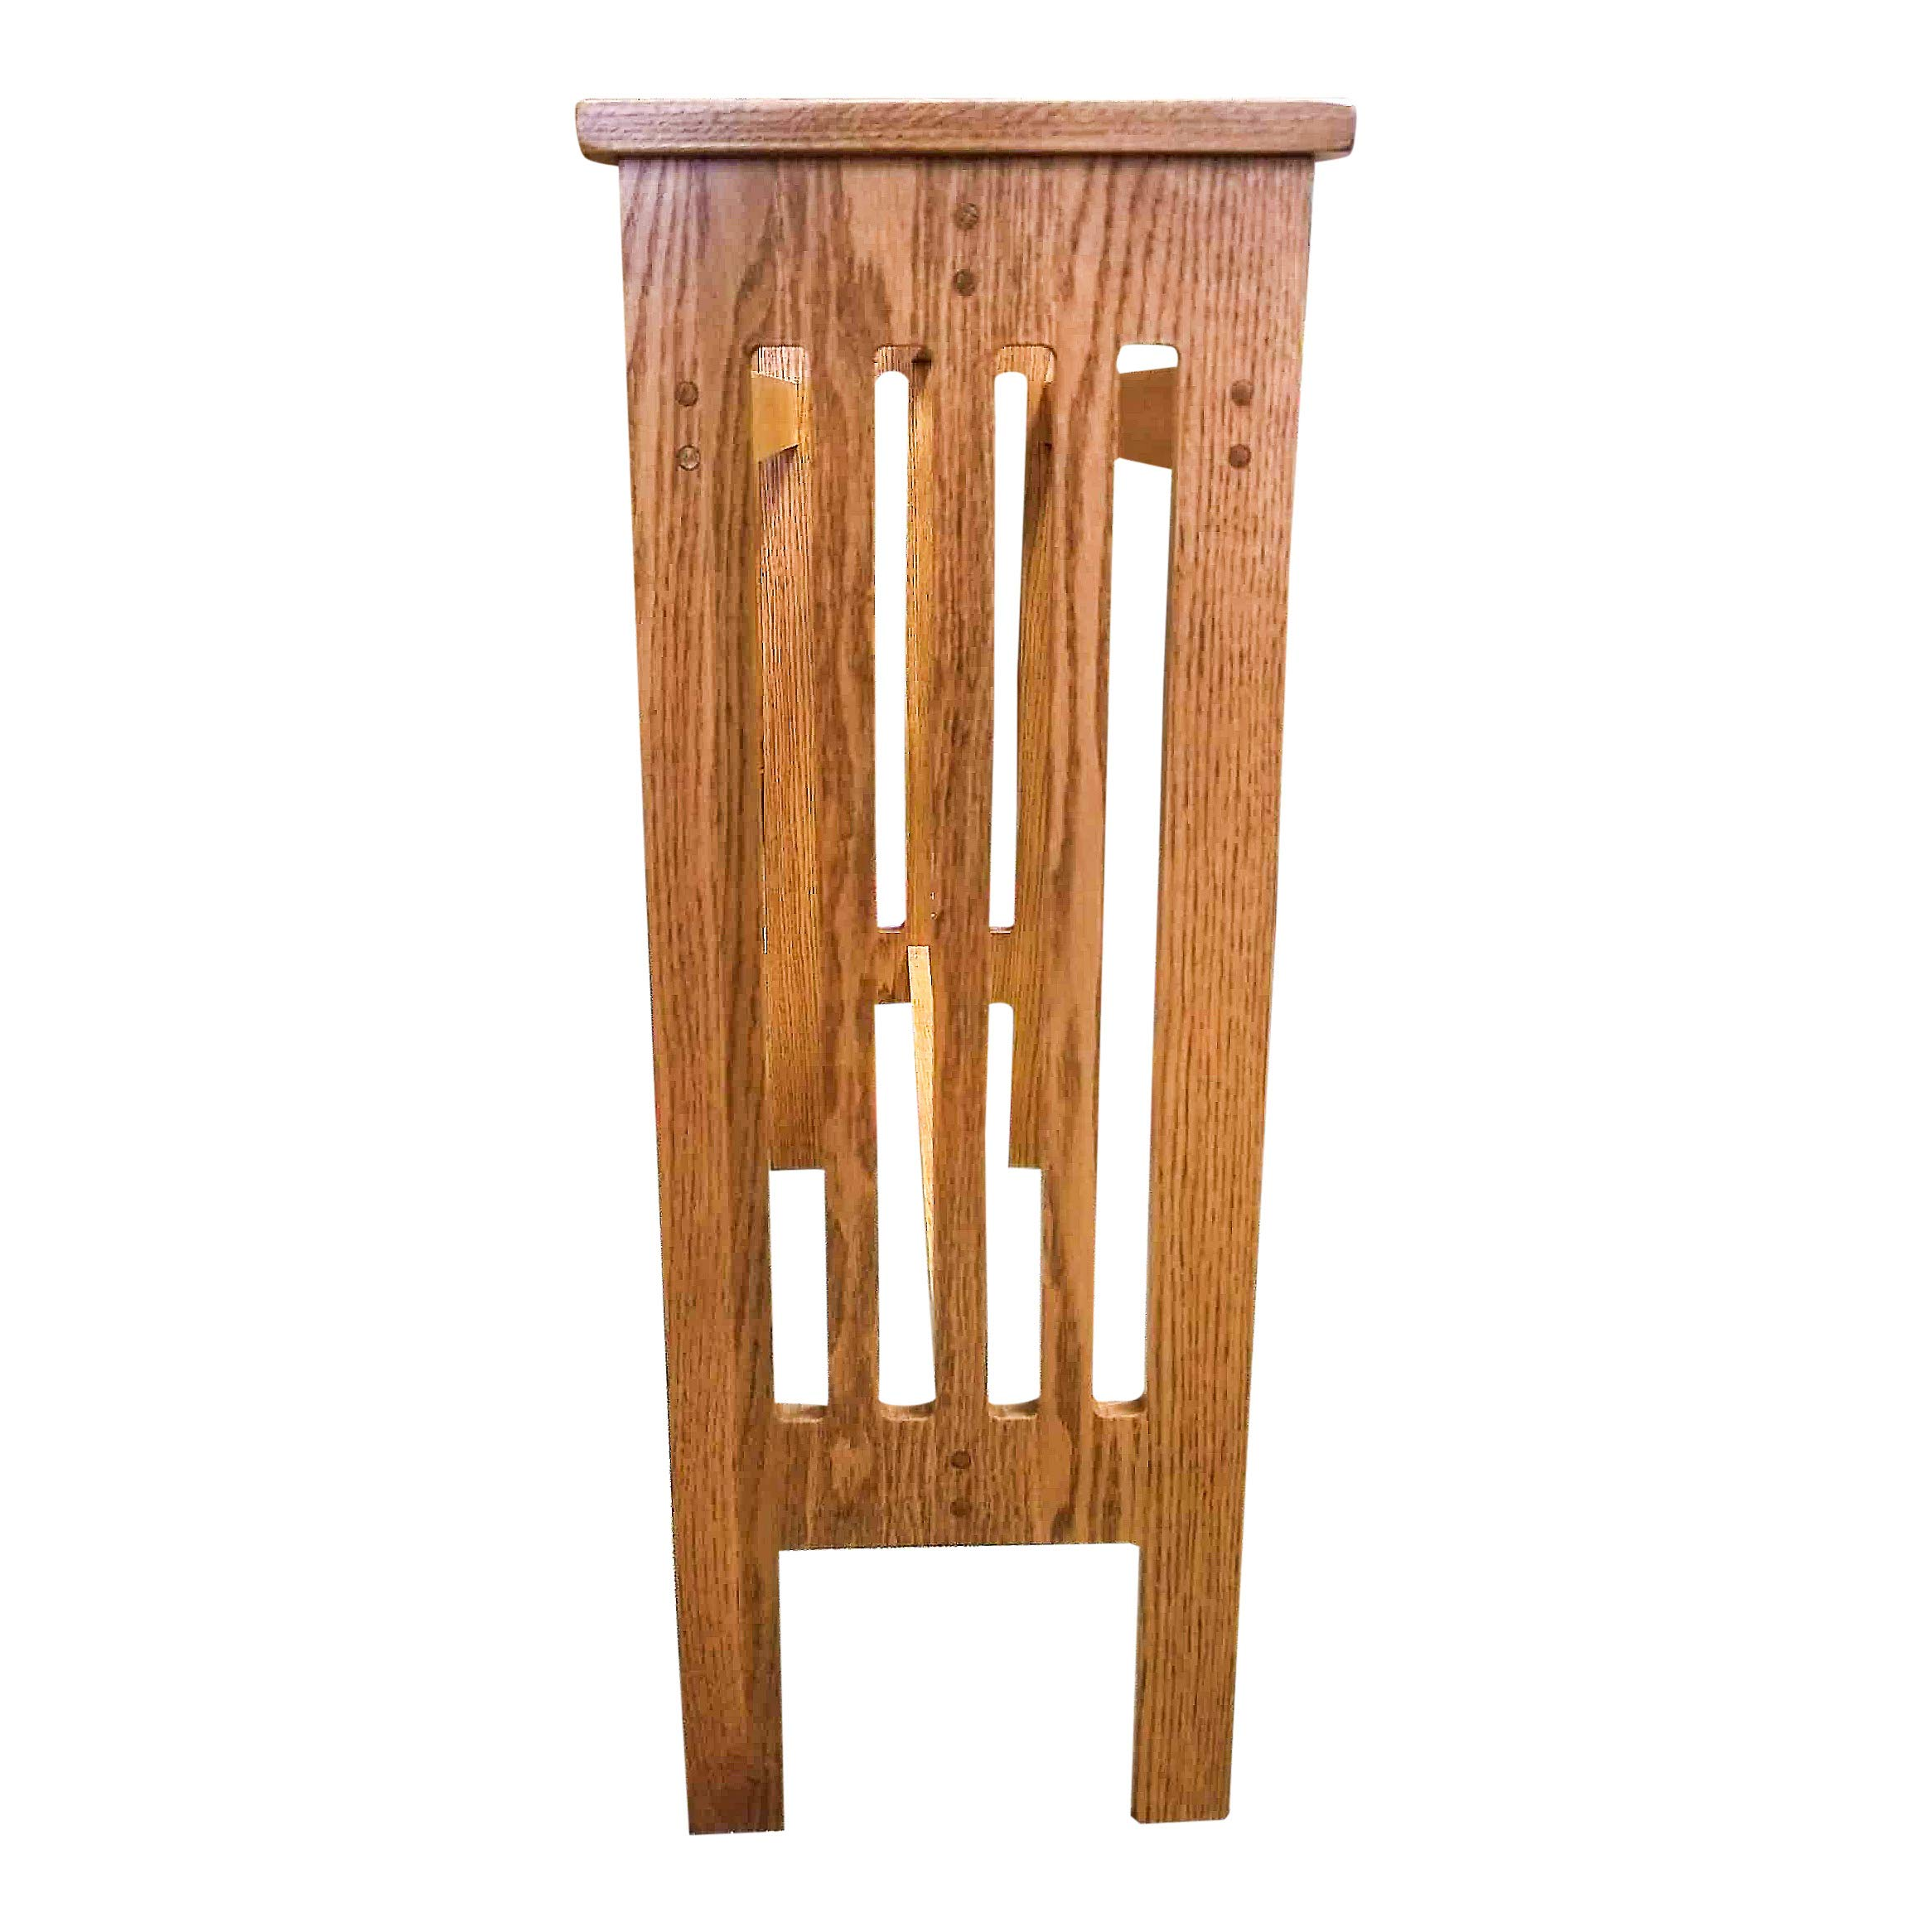 Allamishfurniture Amish Oak Floor Quilt Rack Mission UNASSEMBLED